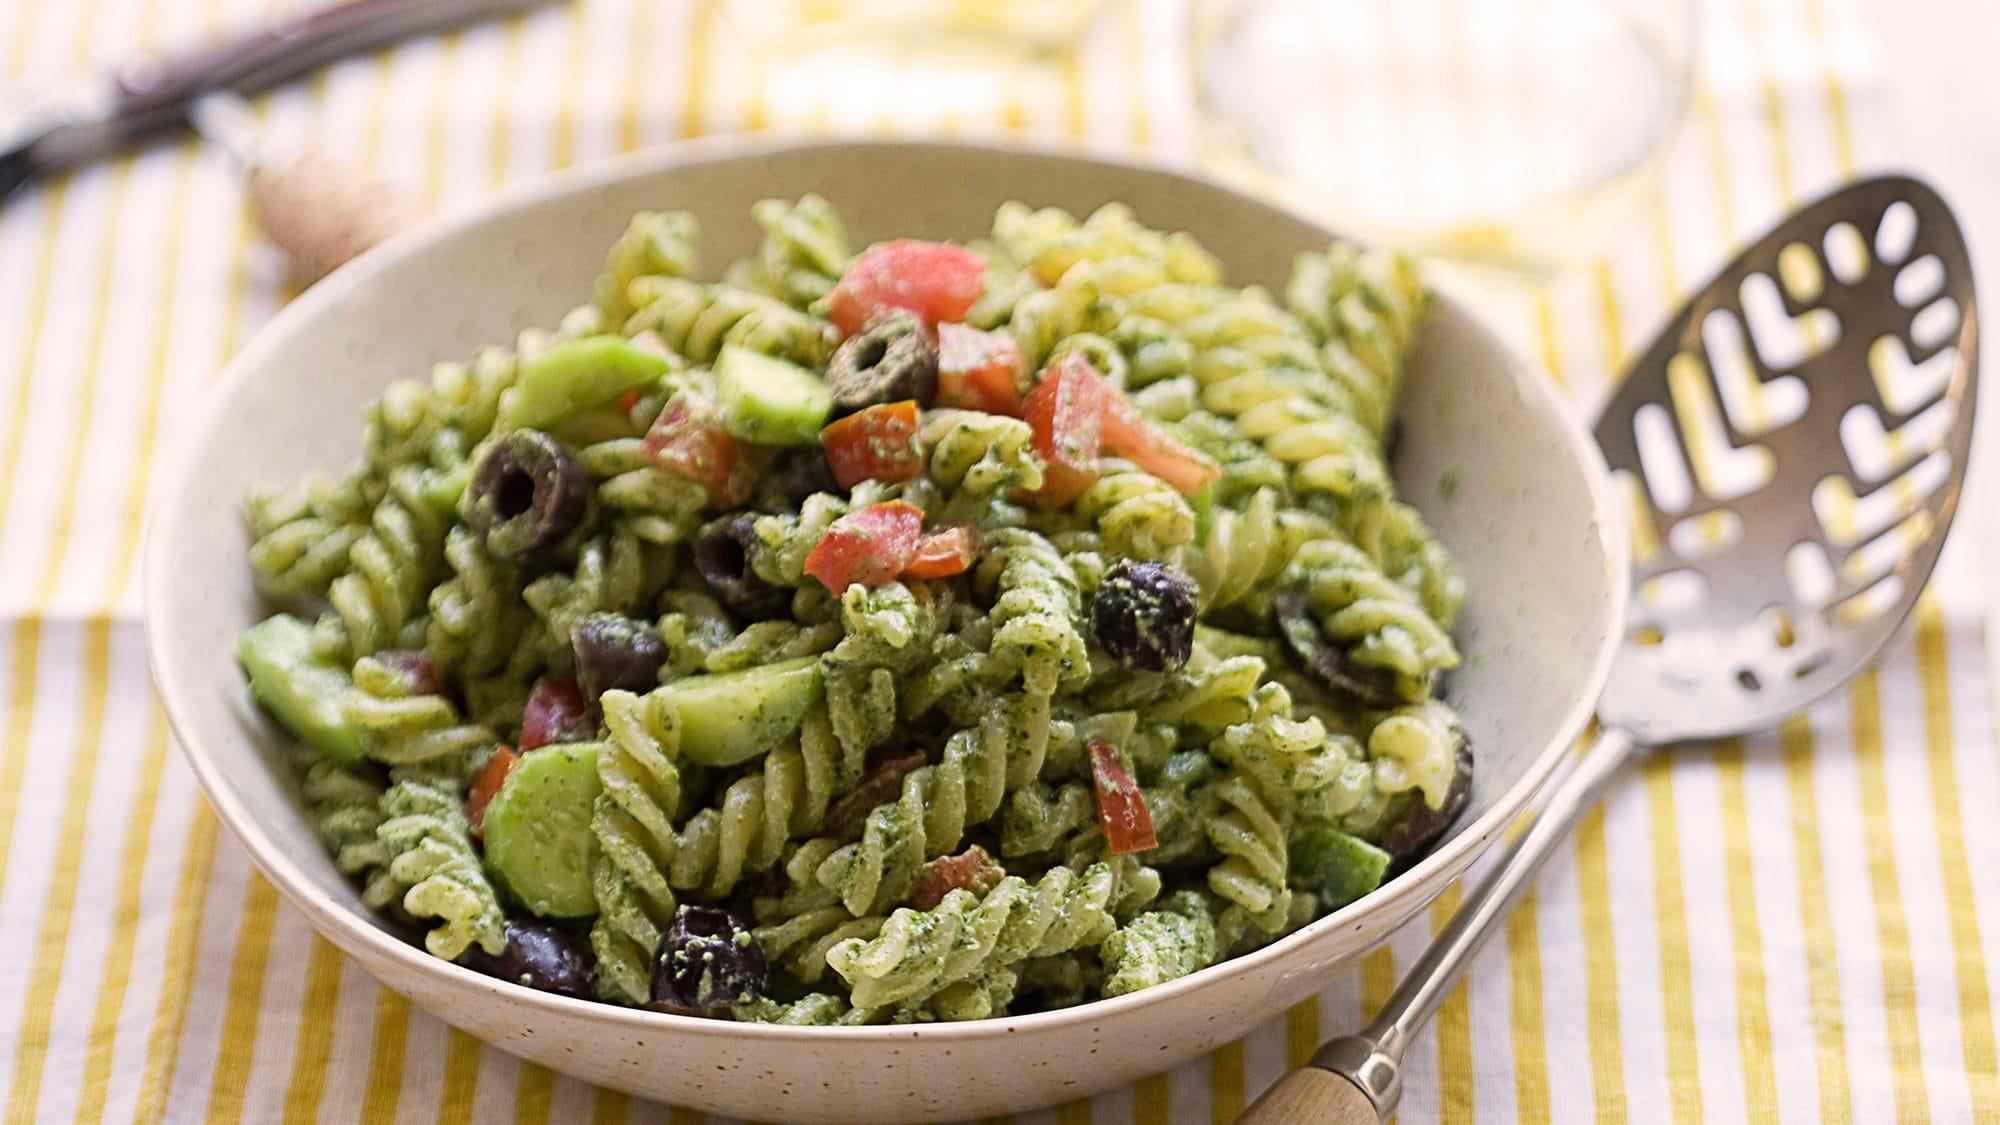 pepita-pesto-pasta-salad-a-cozy-kitchen.jpg